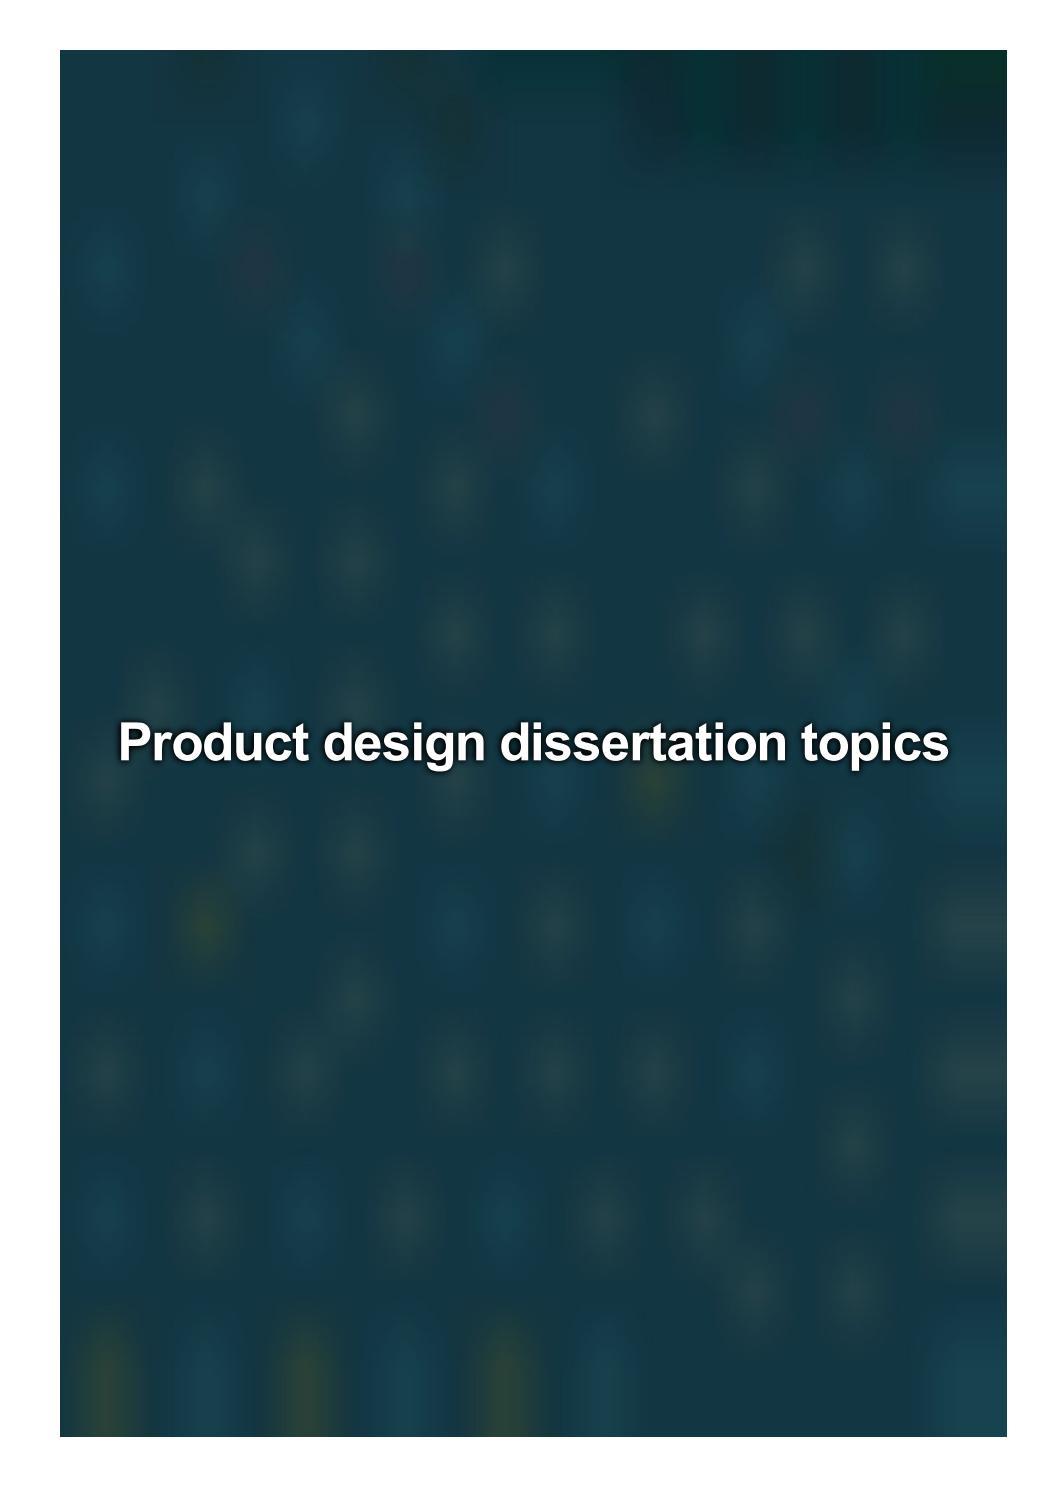 Product design dissertation topics dissertation apa format